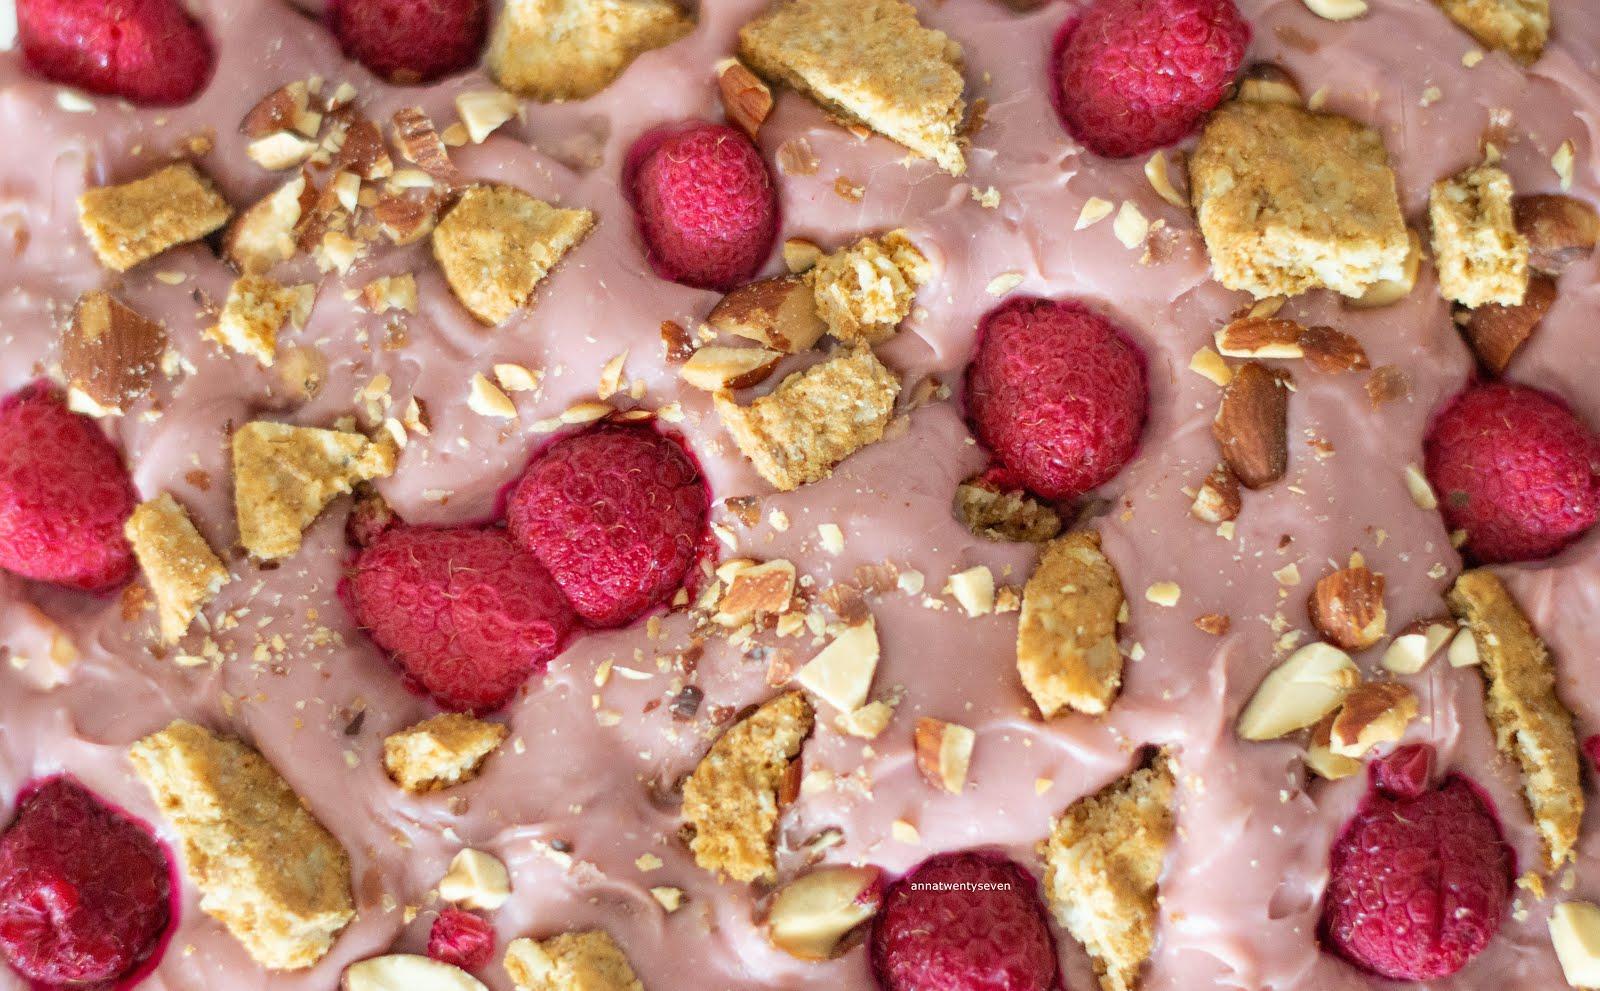 ANNA TWENTY SEVEN RUBY CHOCOLATE FUDGE PINK RECIPE